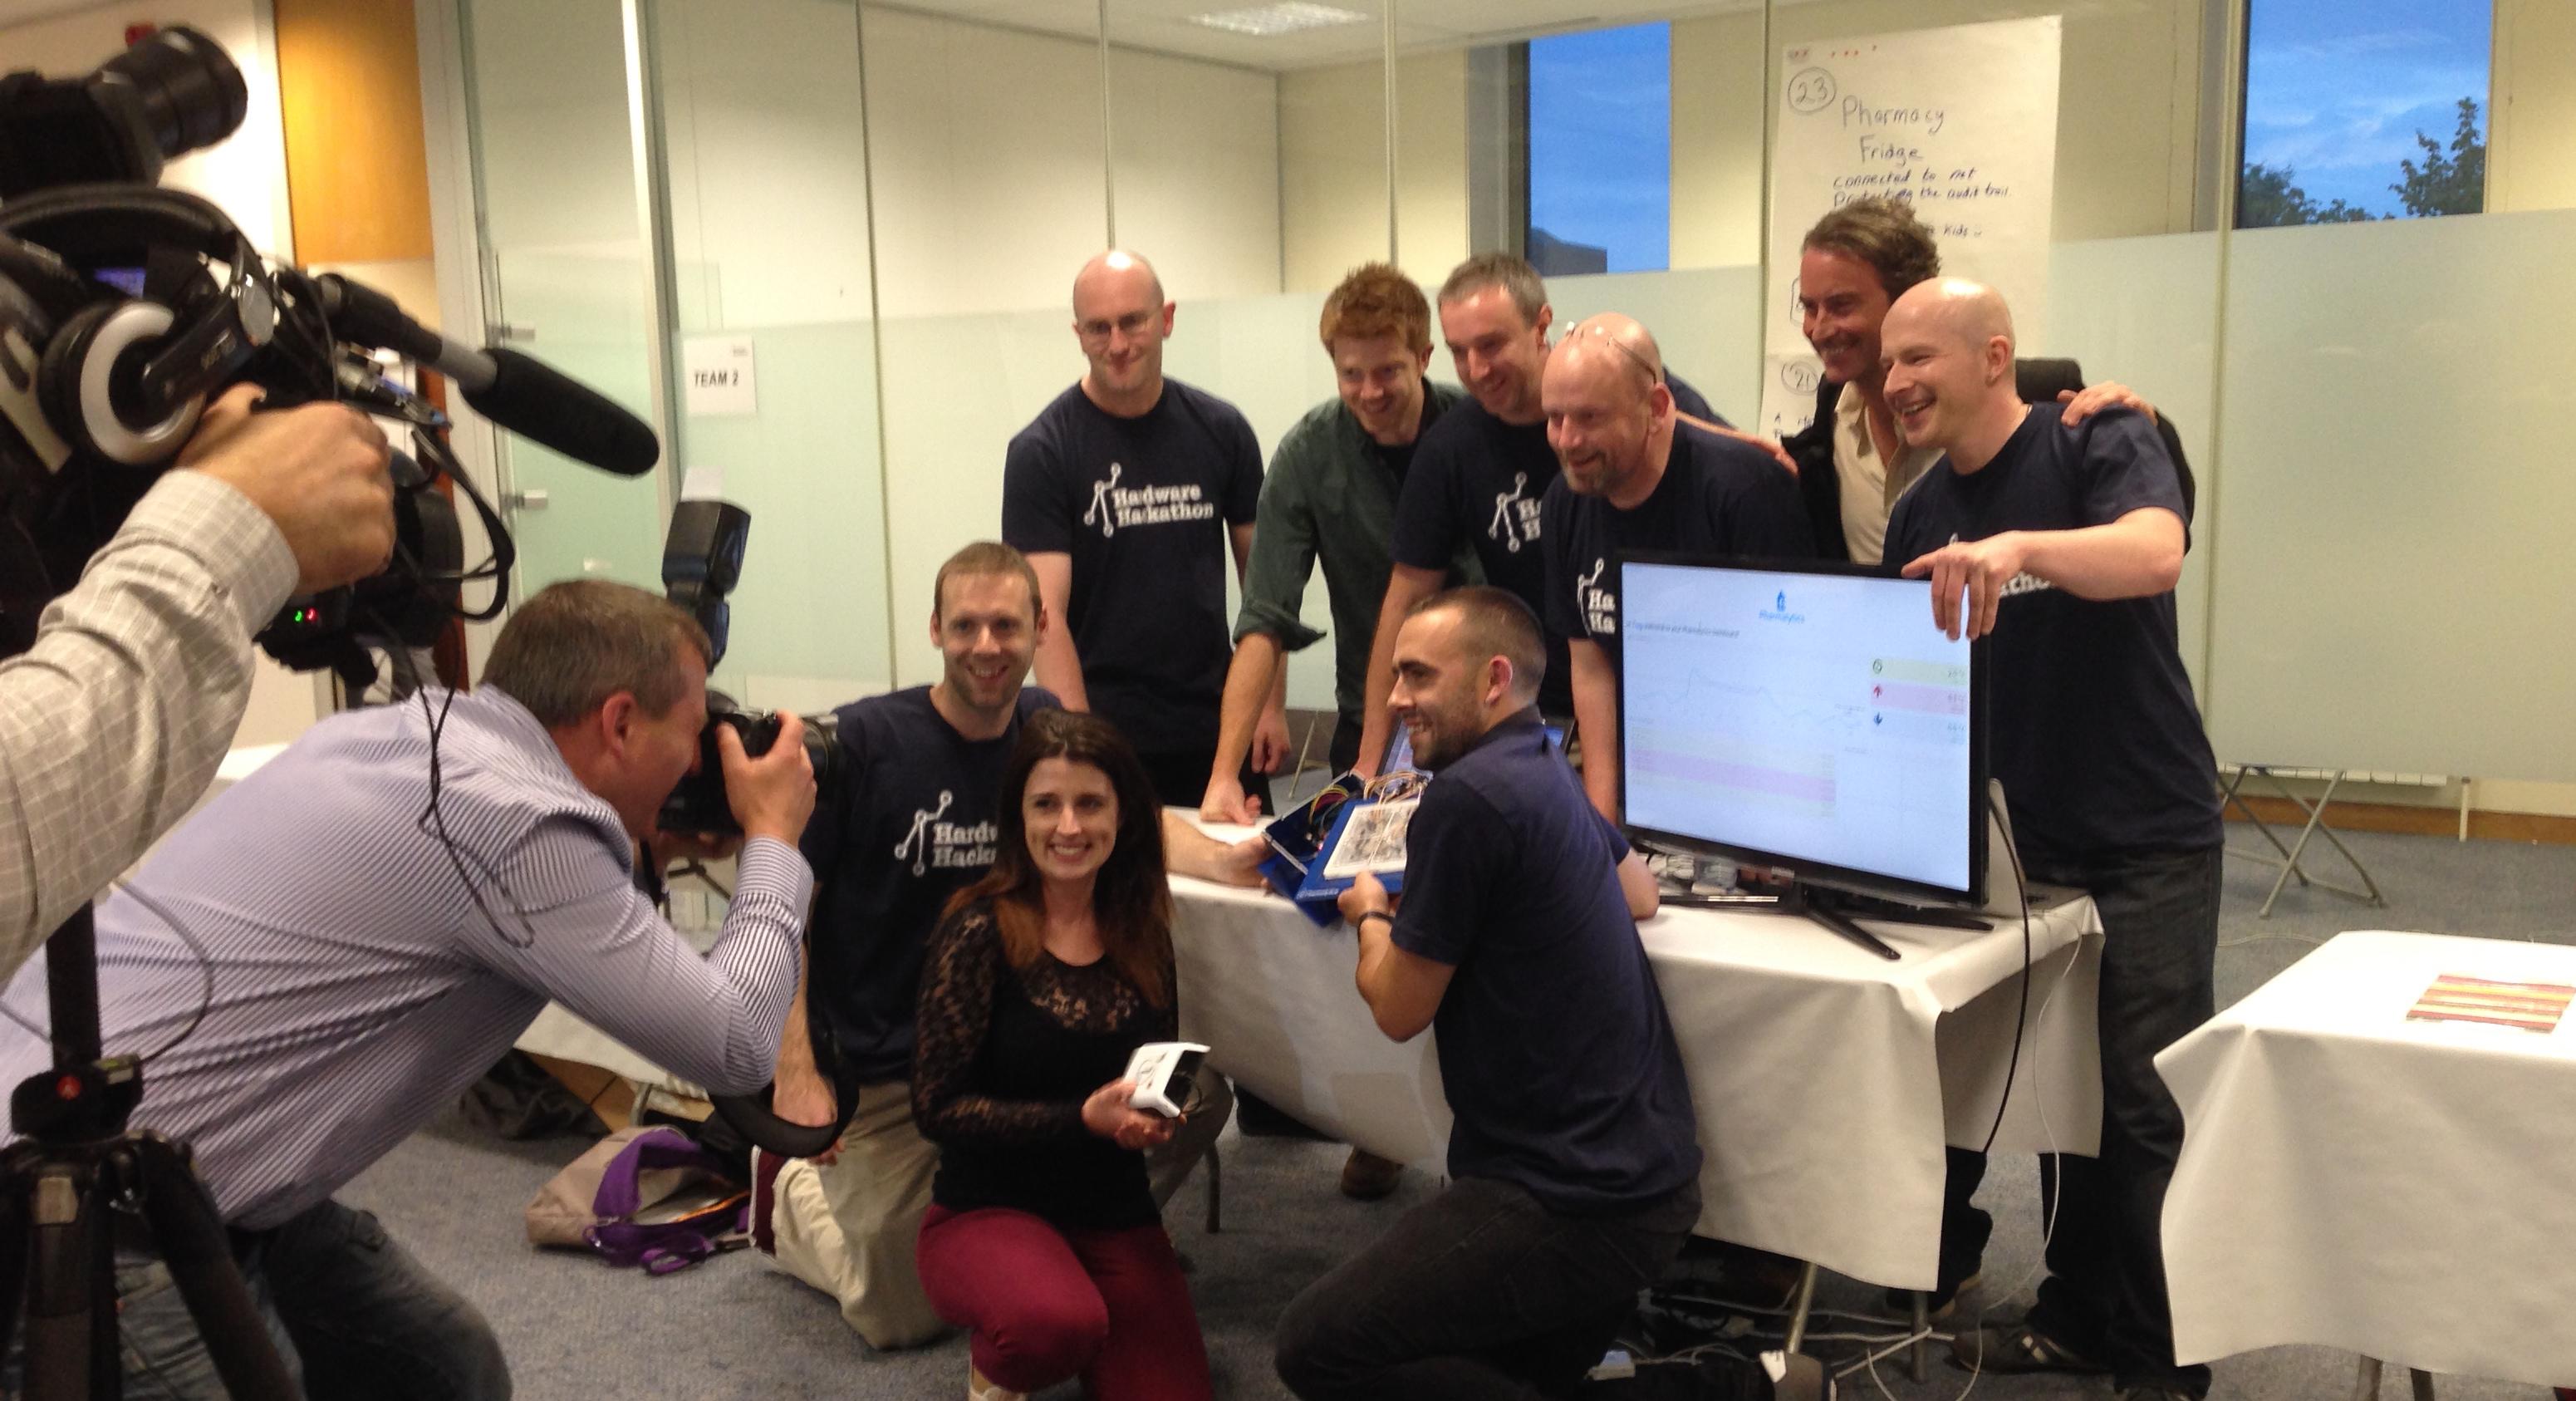 EpiSensor at the Dublin Hardware Hackathon